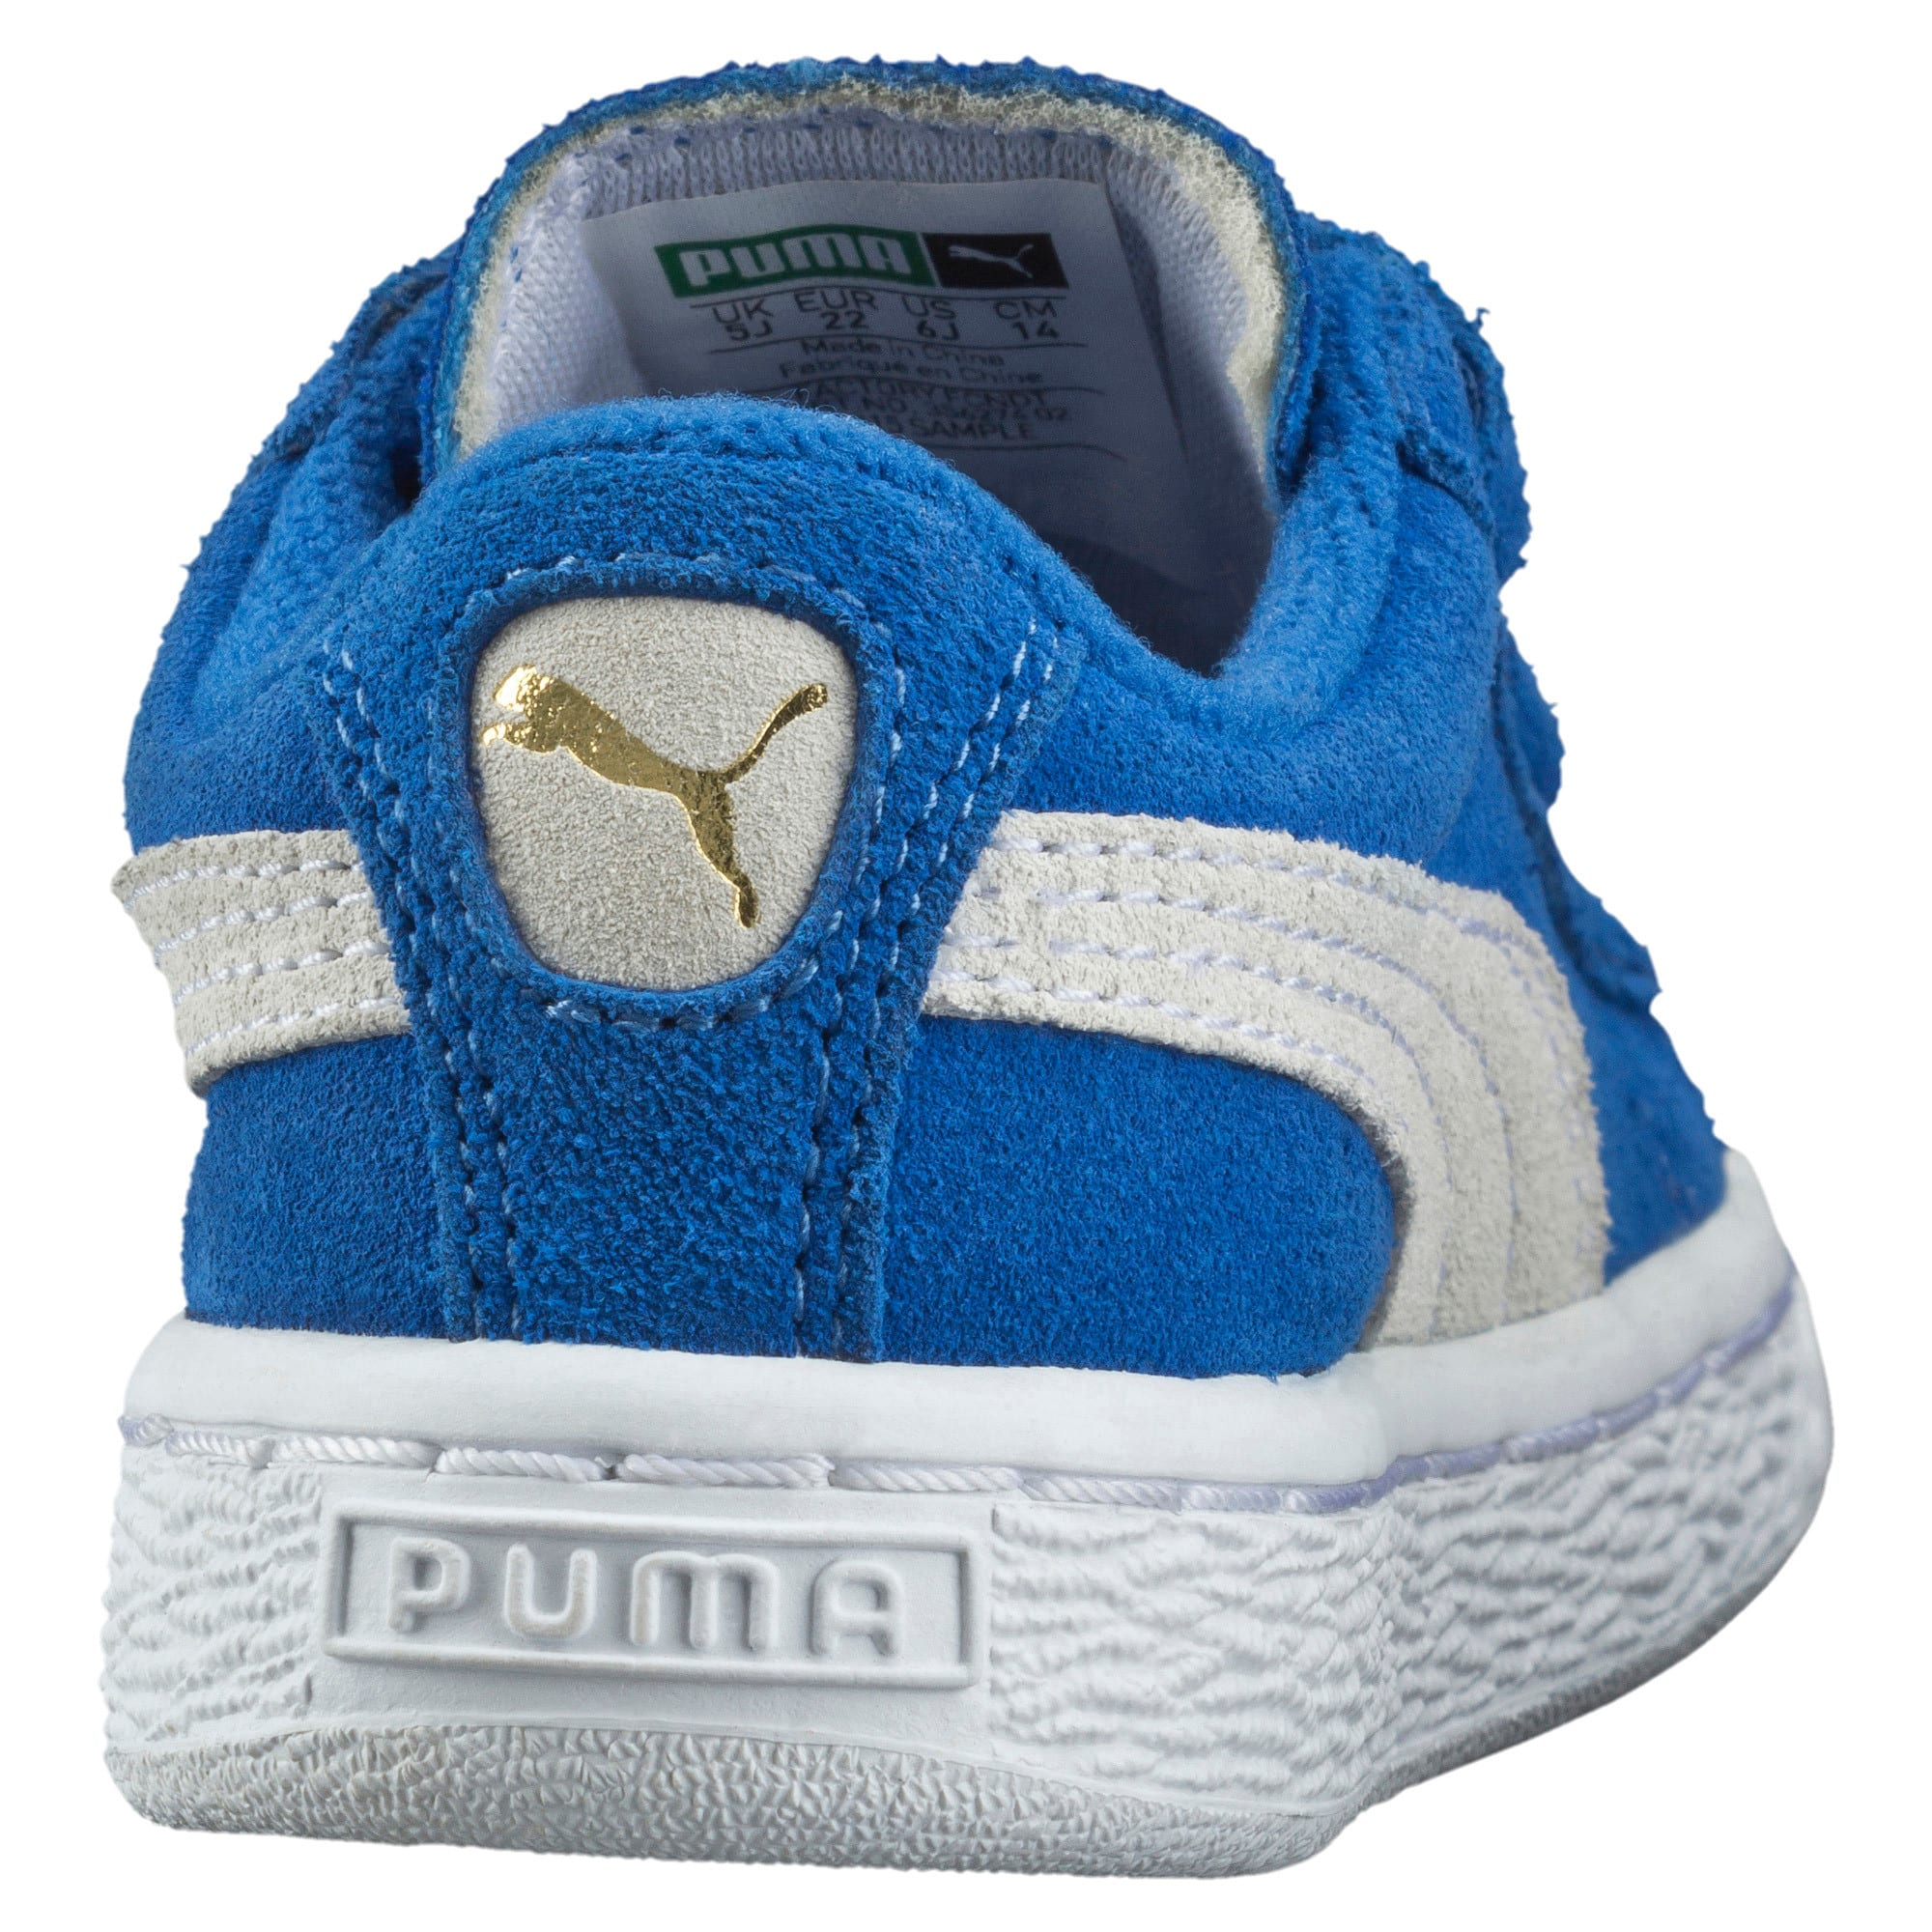 Thumbnail 3 of Suede Preschool Sneaker mit 2 Riemen, Snorkel Blue-Puma White, medium